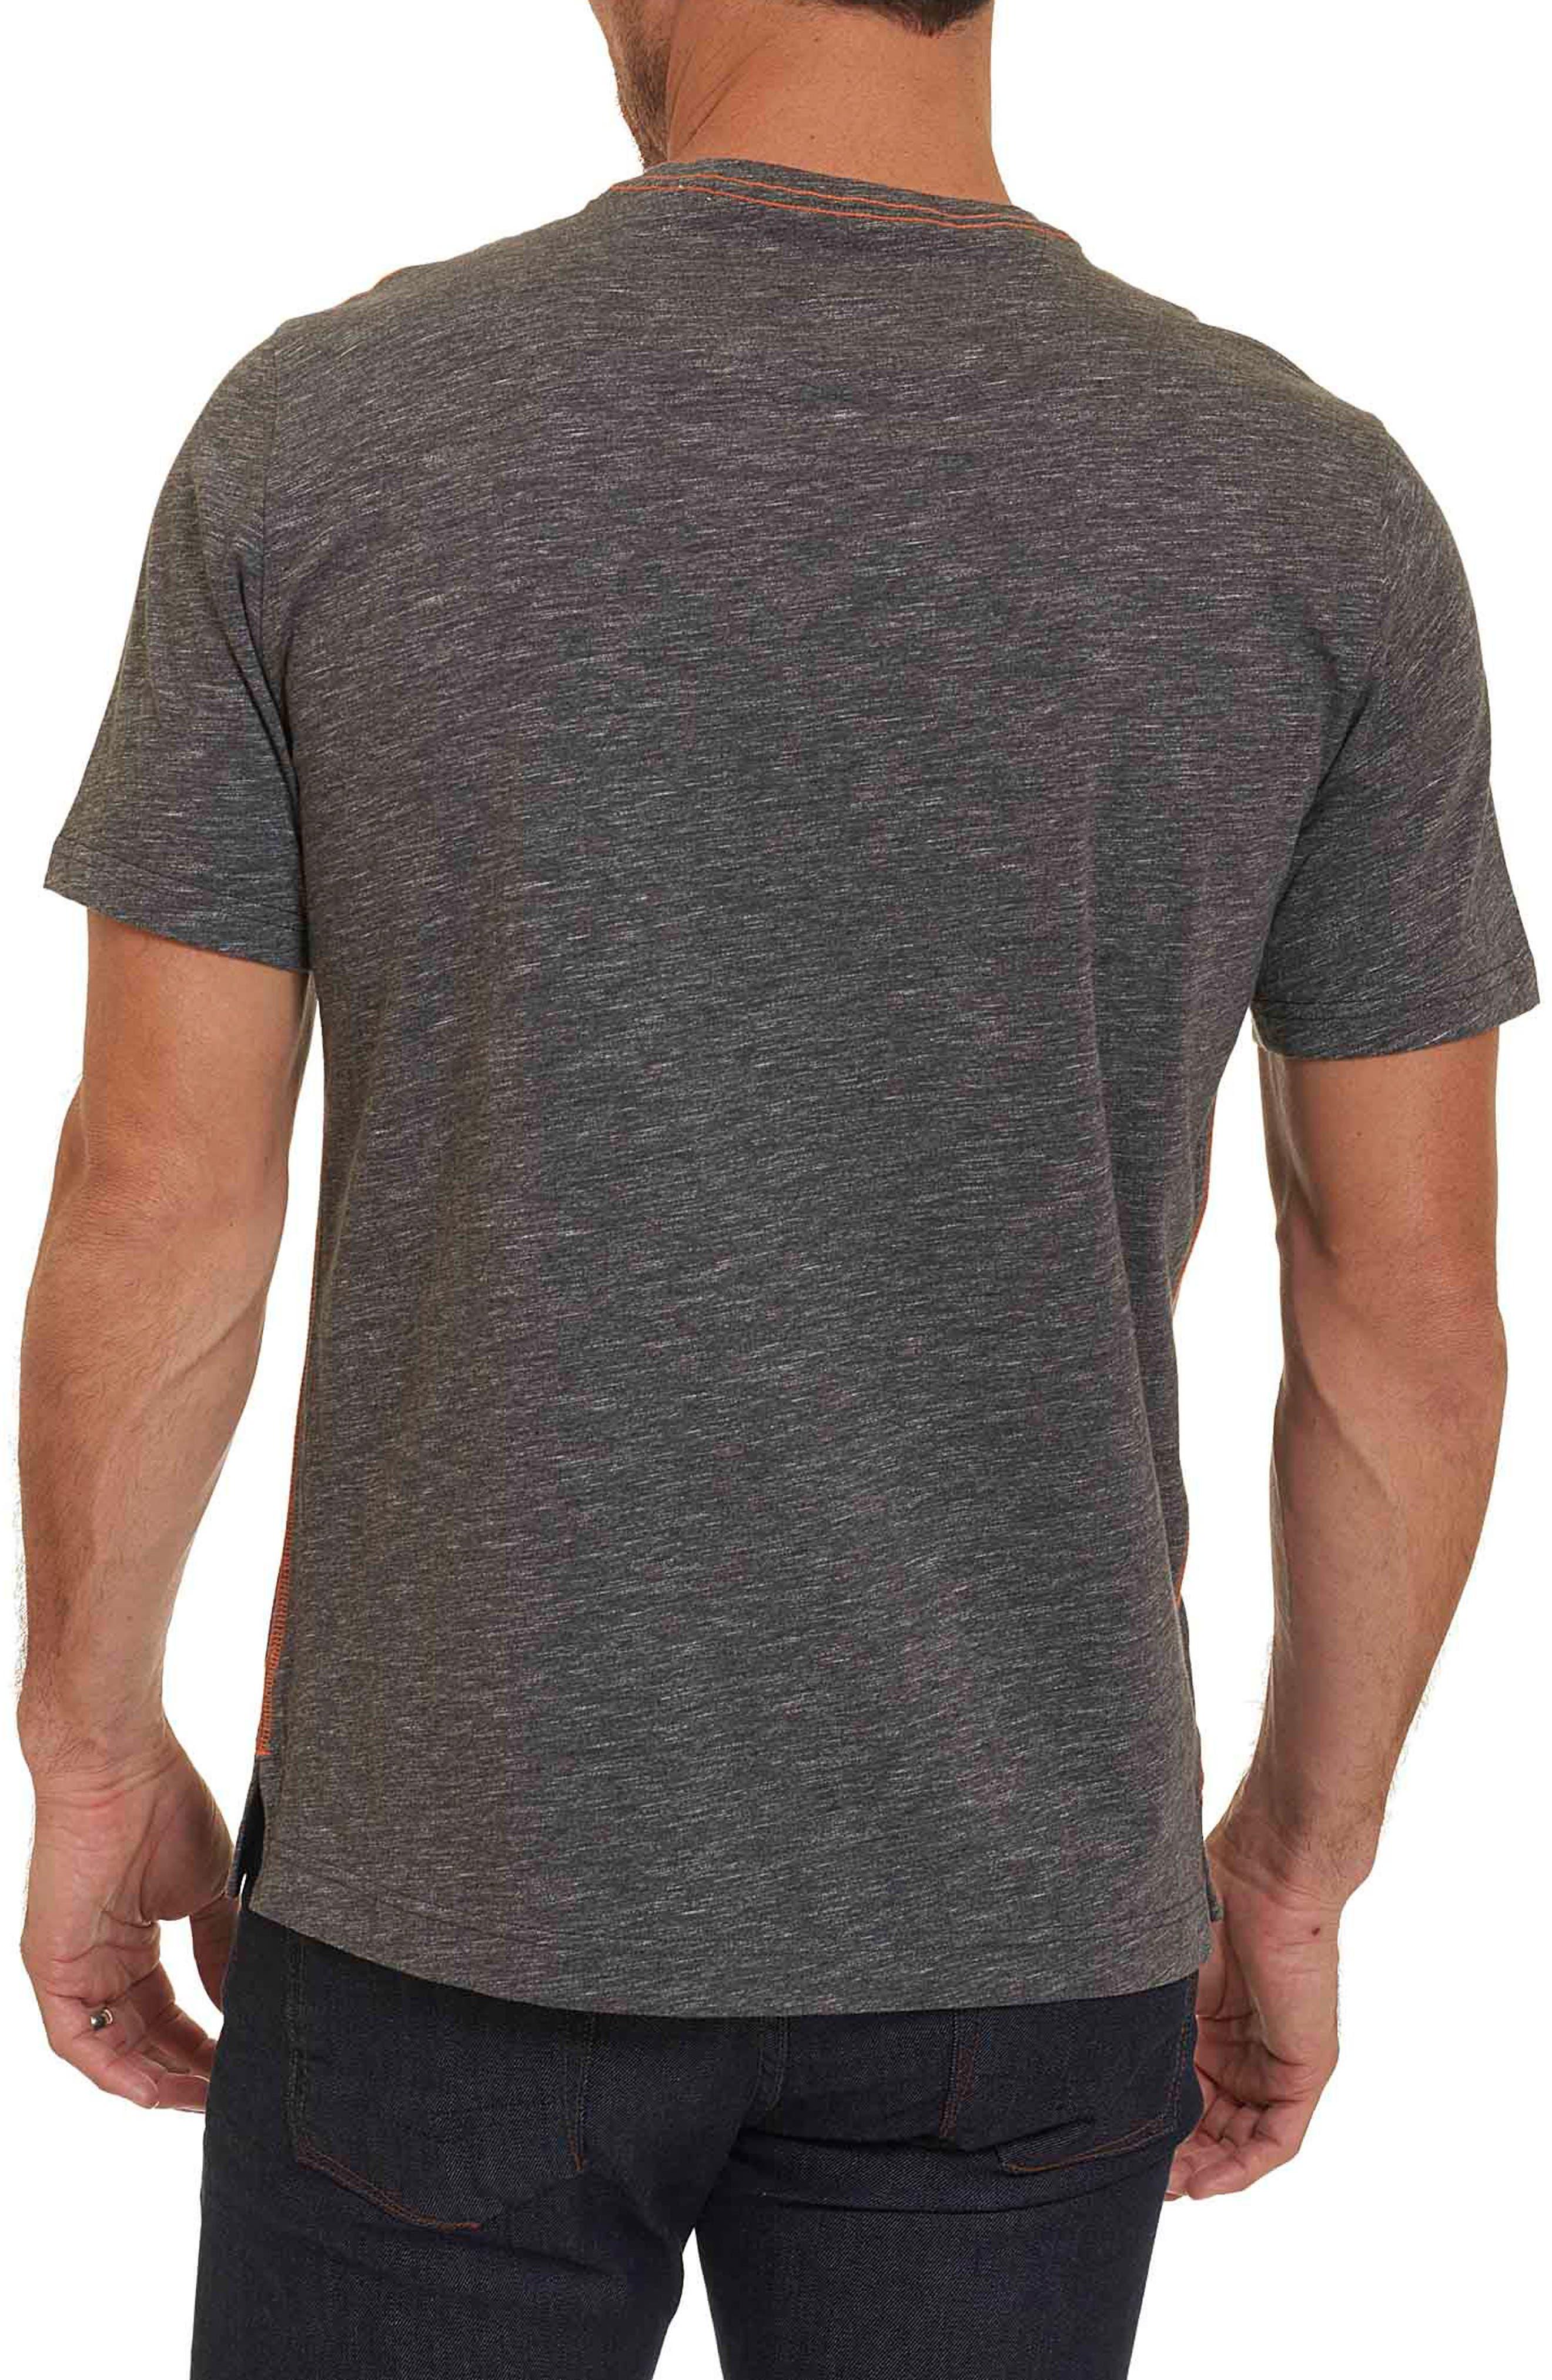 Alternate Image 2  - Robert Graham Torrance Graphic T-Shirt